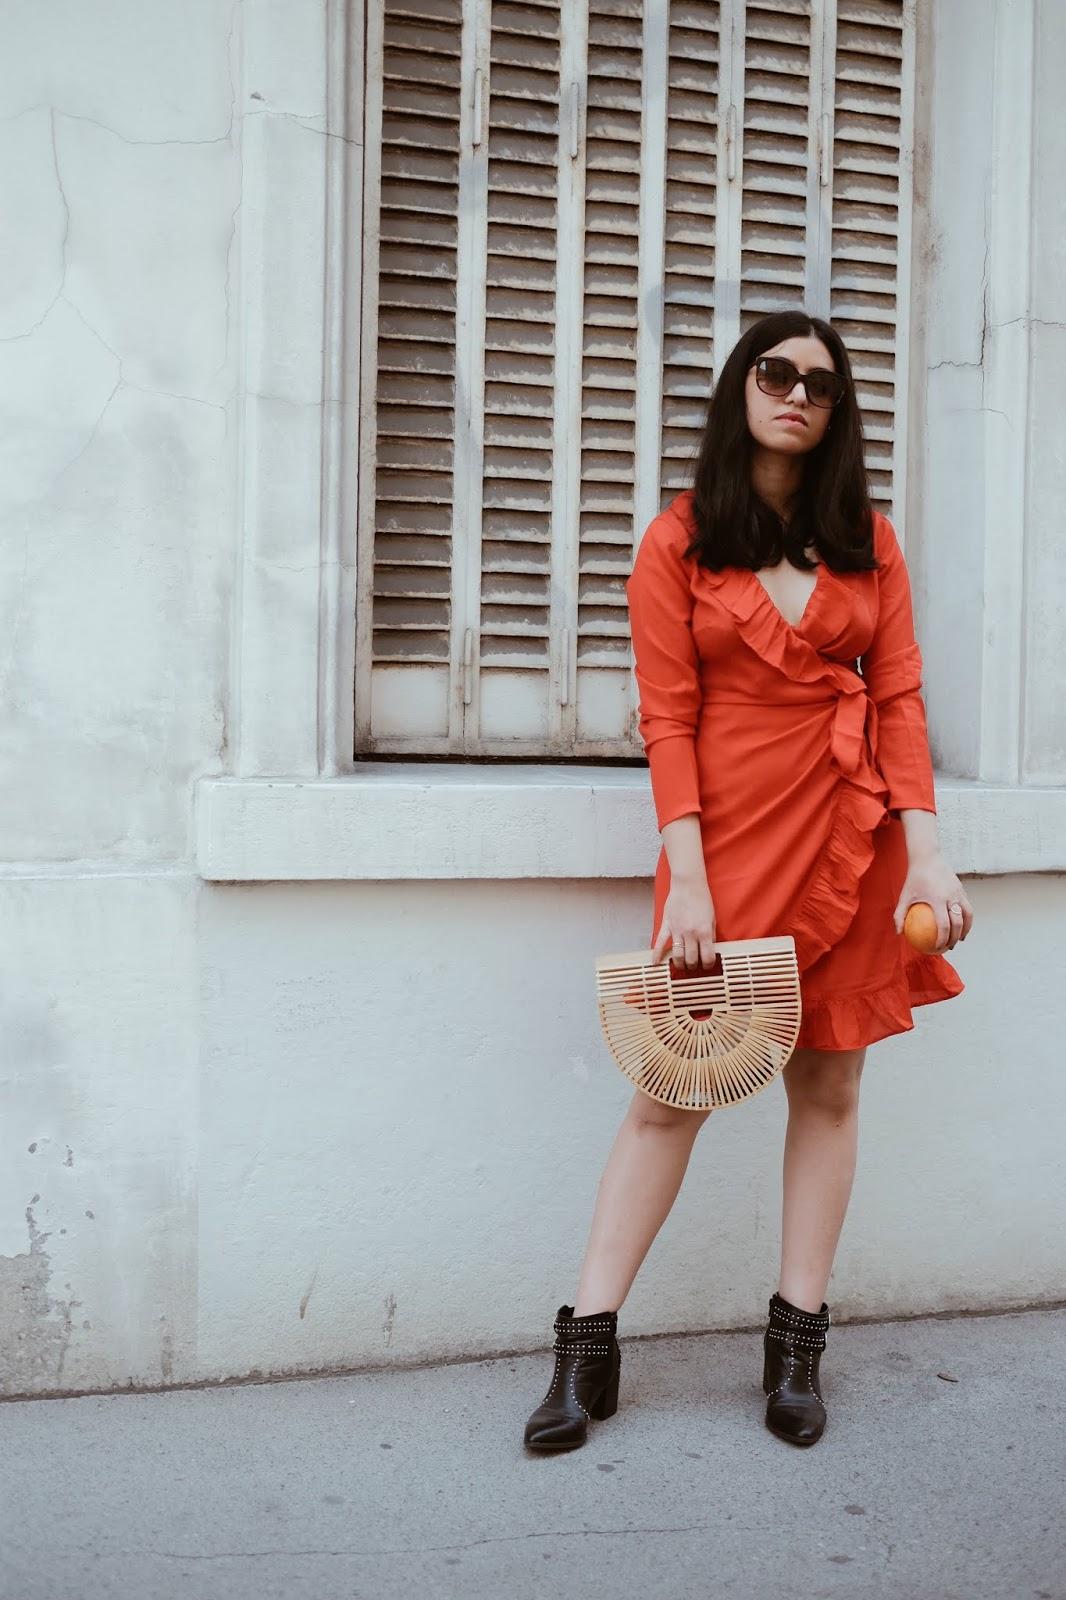 blog mode lyon, blogueuse lyonnaise, blogueuse à lyon, blogueuse mode, ameni daily, amenidaily, modeuse, blog mode paris, blogueuse parisienne